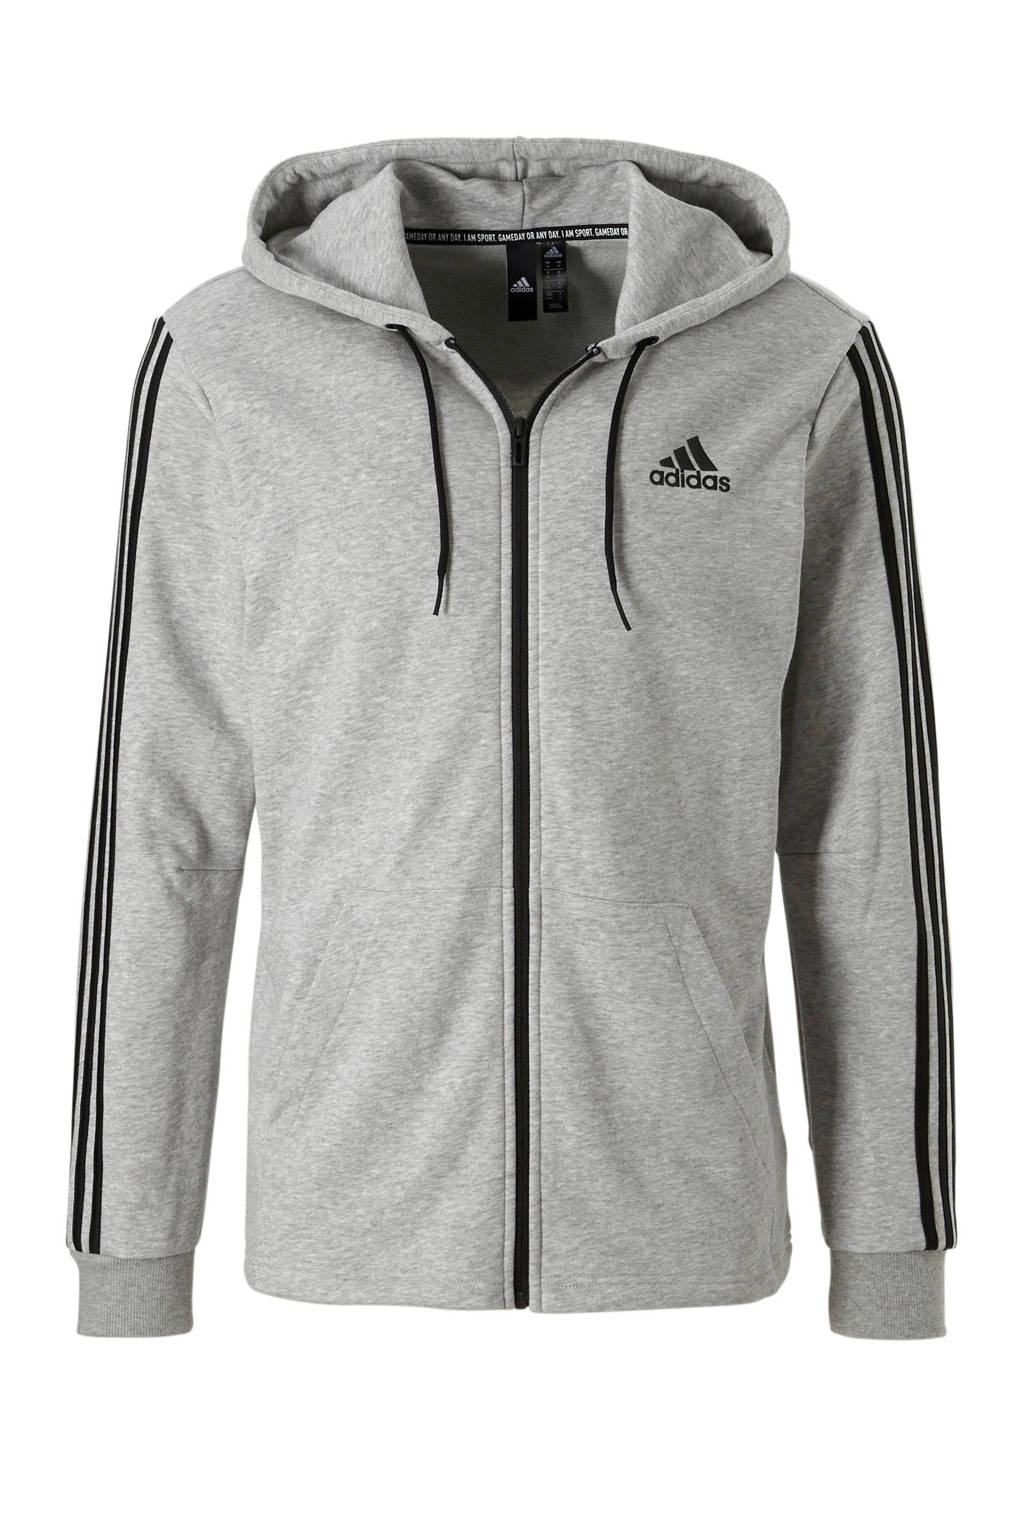 adidas performance   sportvest grijs, Grijs/zwart